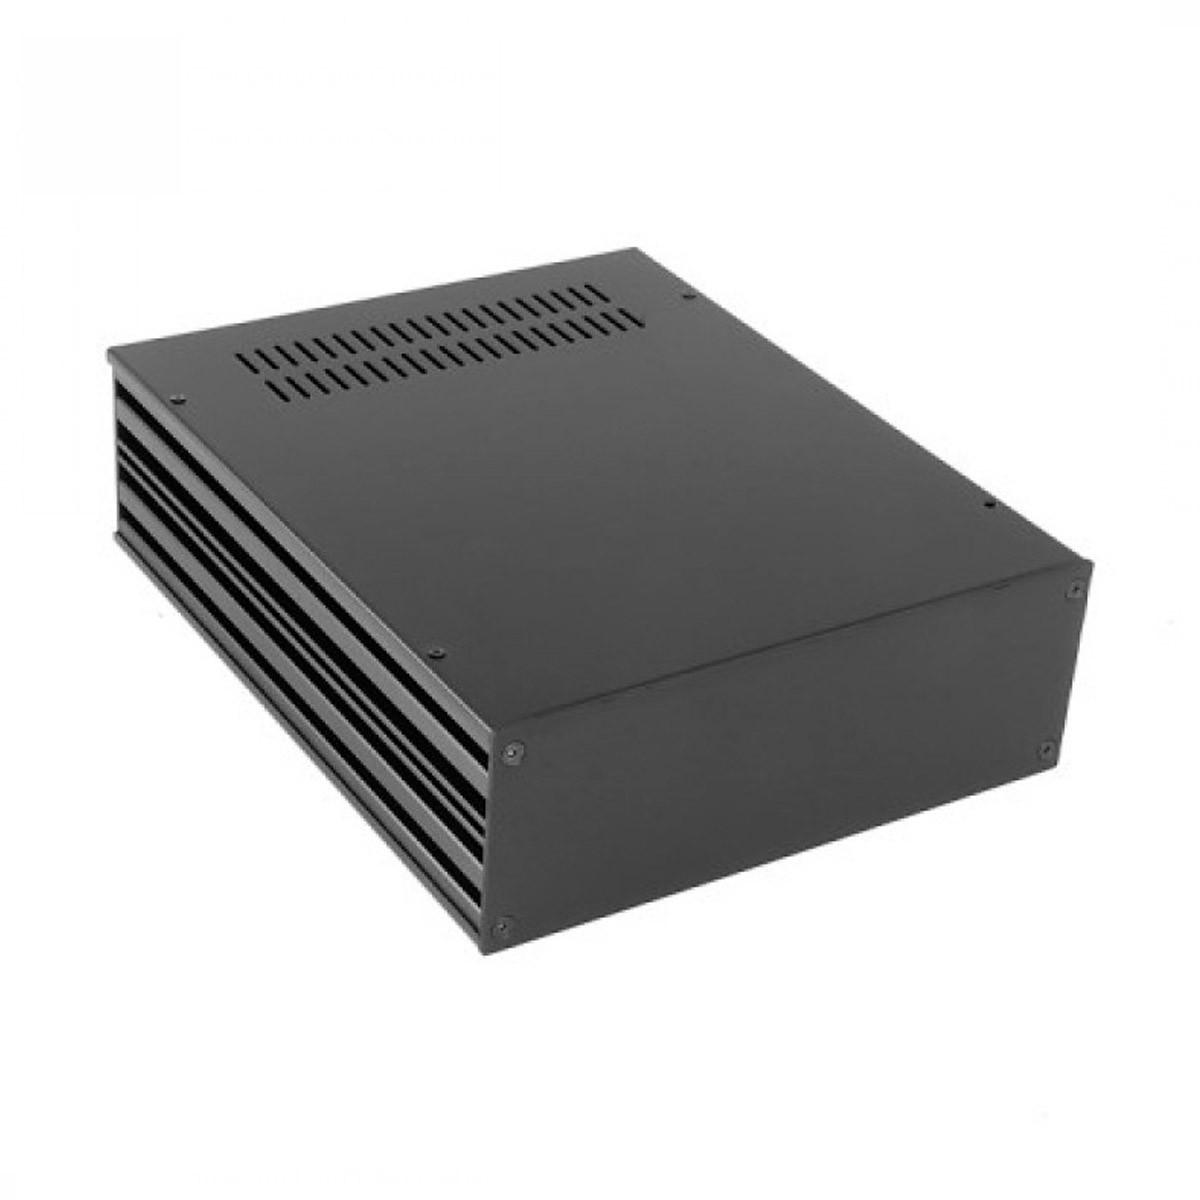 HIFI 2000 Boitier 3mm GX288 80x230x280 Façade Noire